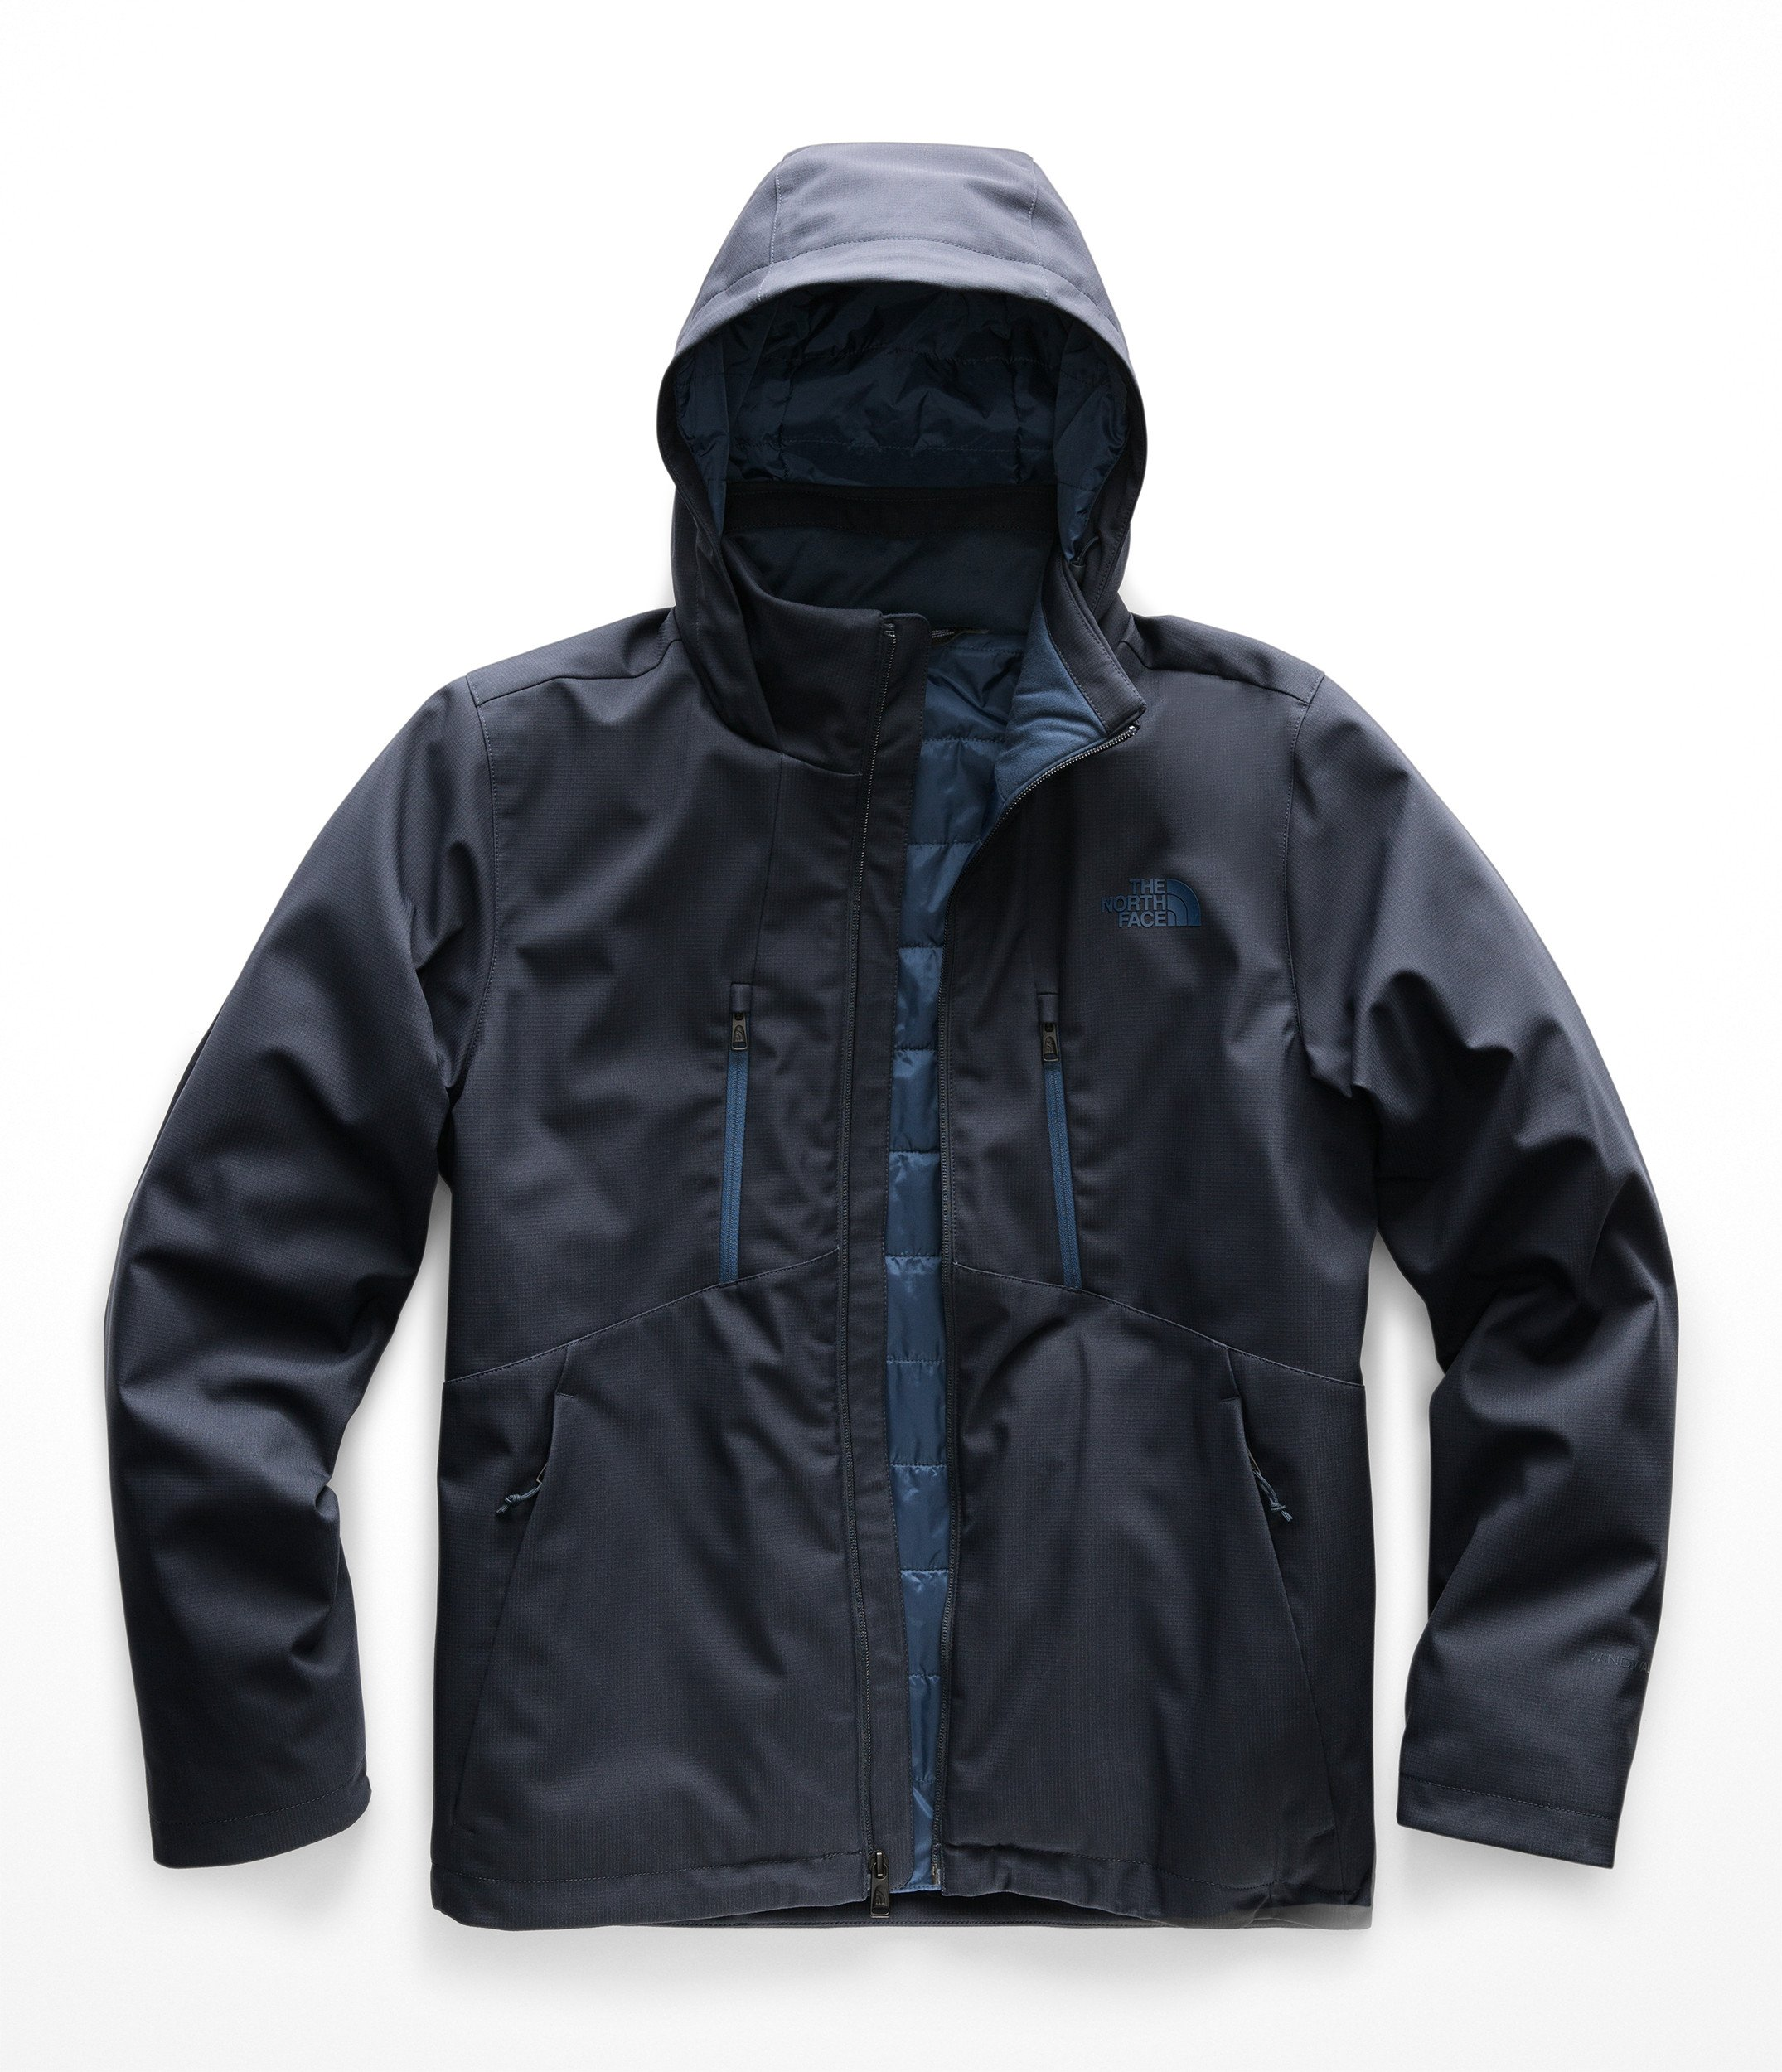 The North Face Men's Apex Elevation Jacket - Urban Navy & Urban Navy - L by The North Face